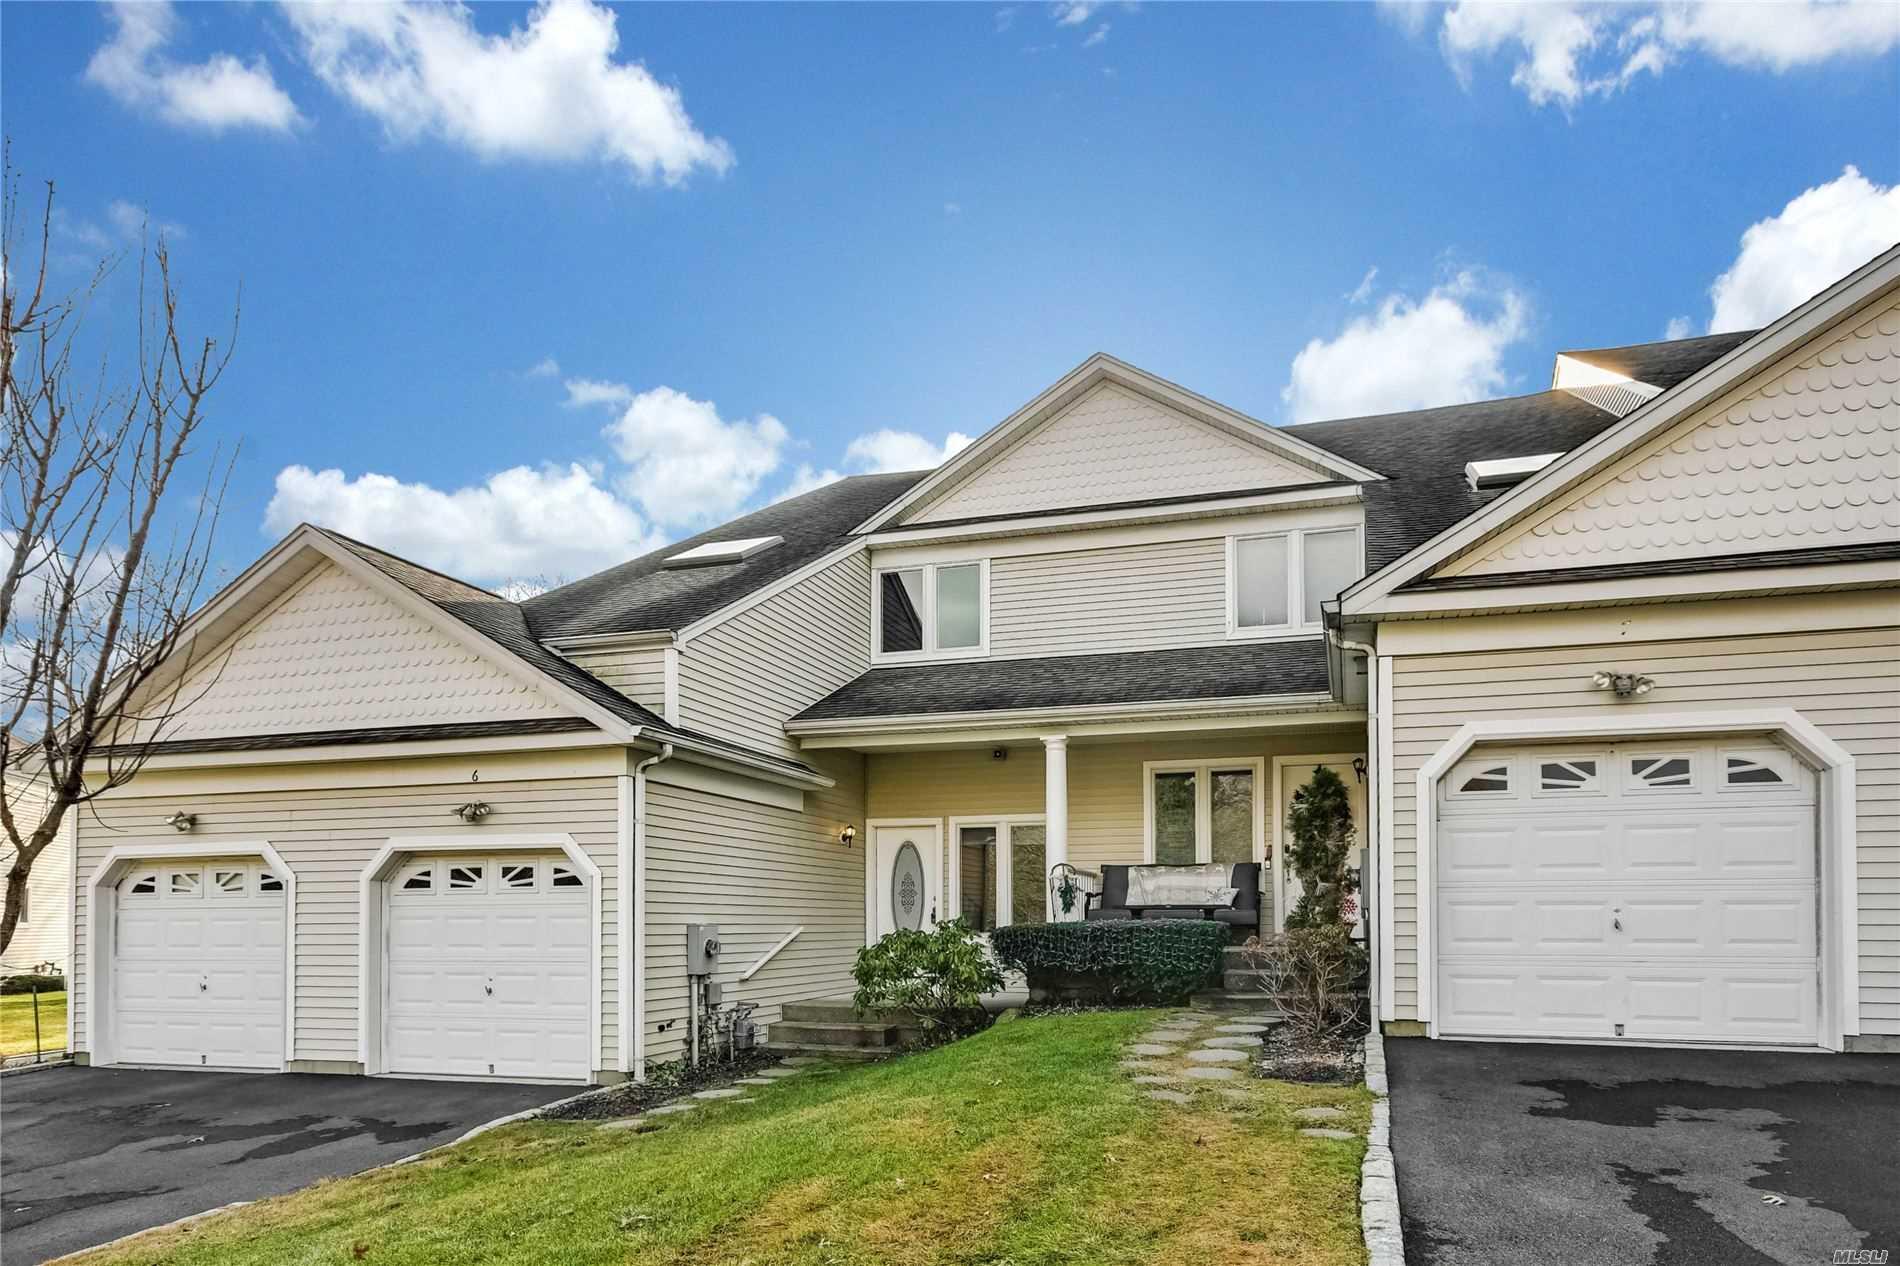 Property for sale at 6 Lindbergh Circle, Huntington NY 11743, Huntington,  New York 11743